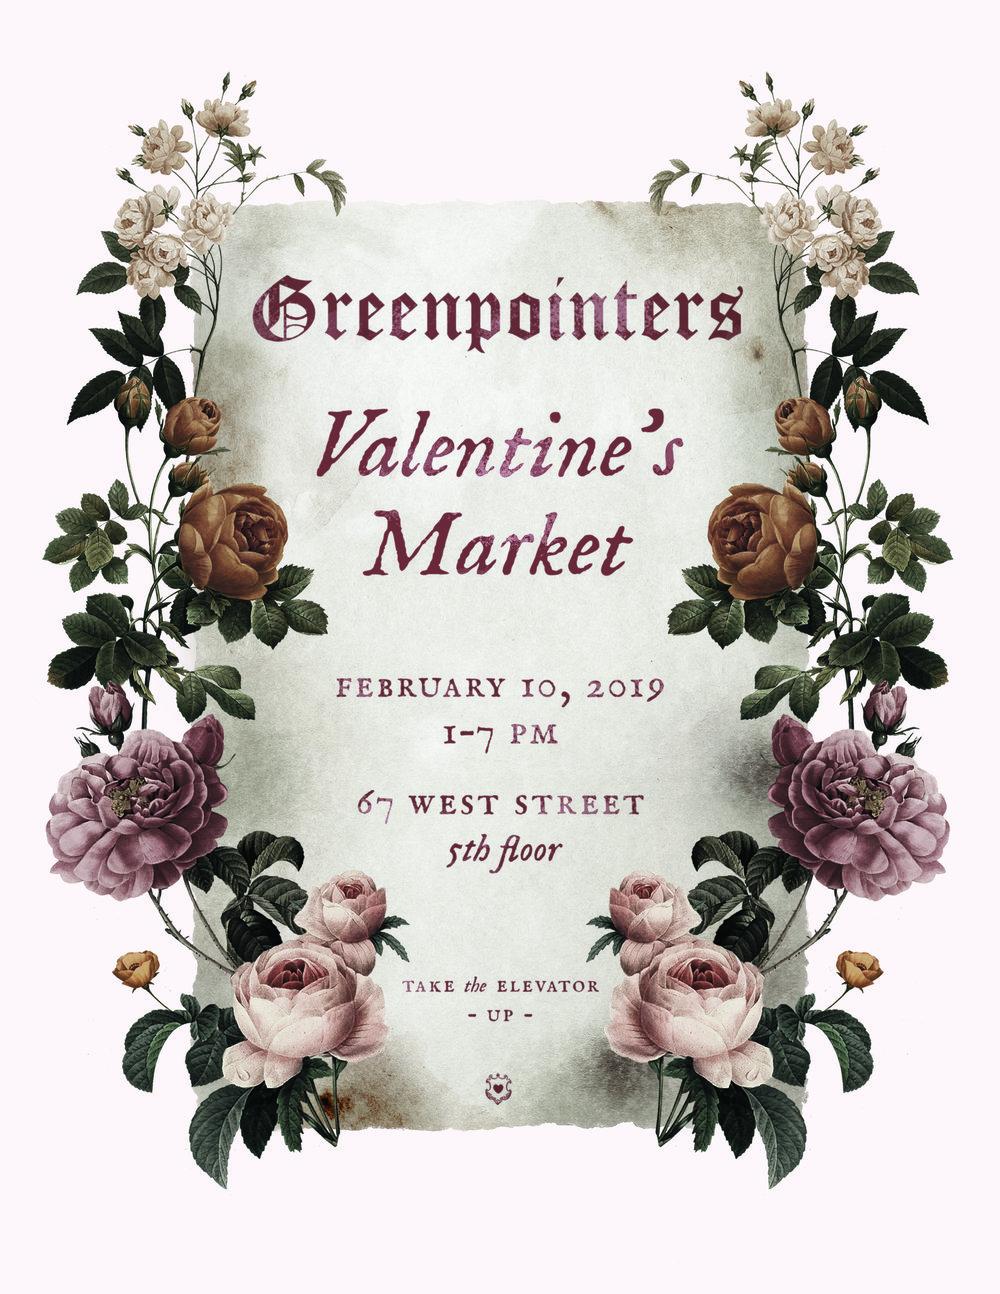 Greenpointers Valentines Market